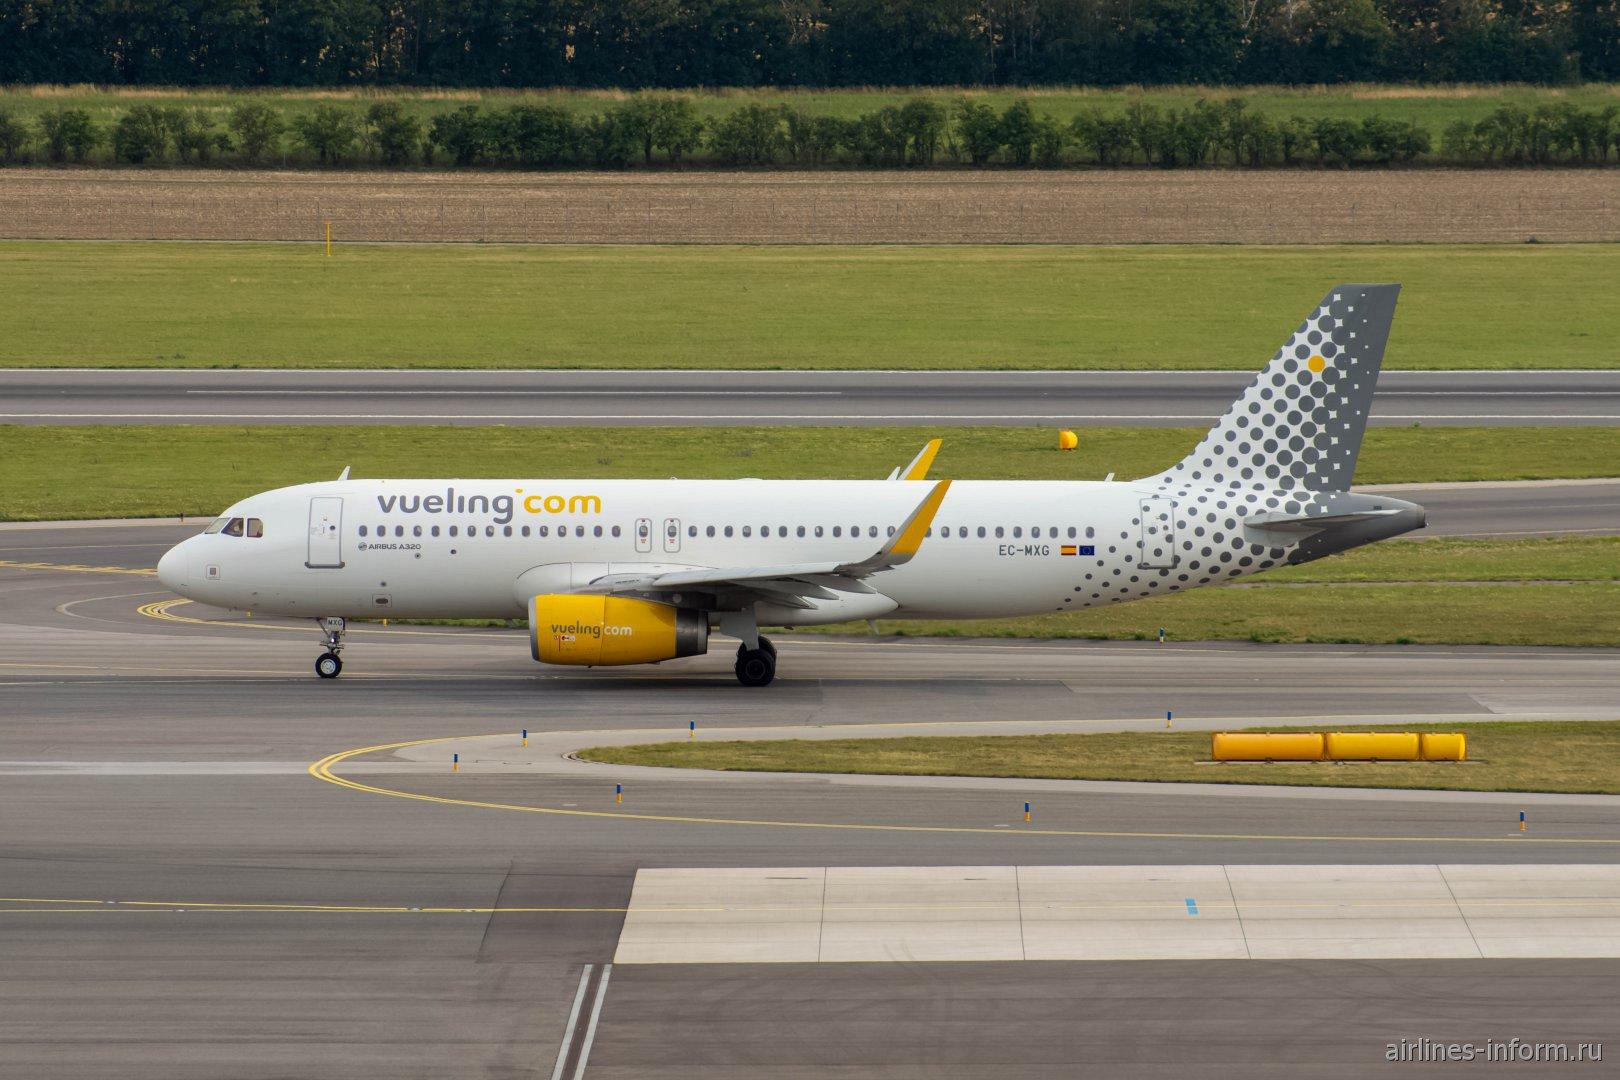 Airbus A320 EC-MXG авиакомпании Vueling в аэропорту Вена Швехат